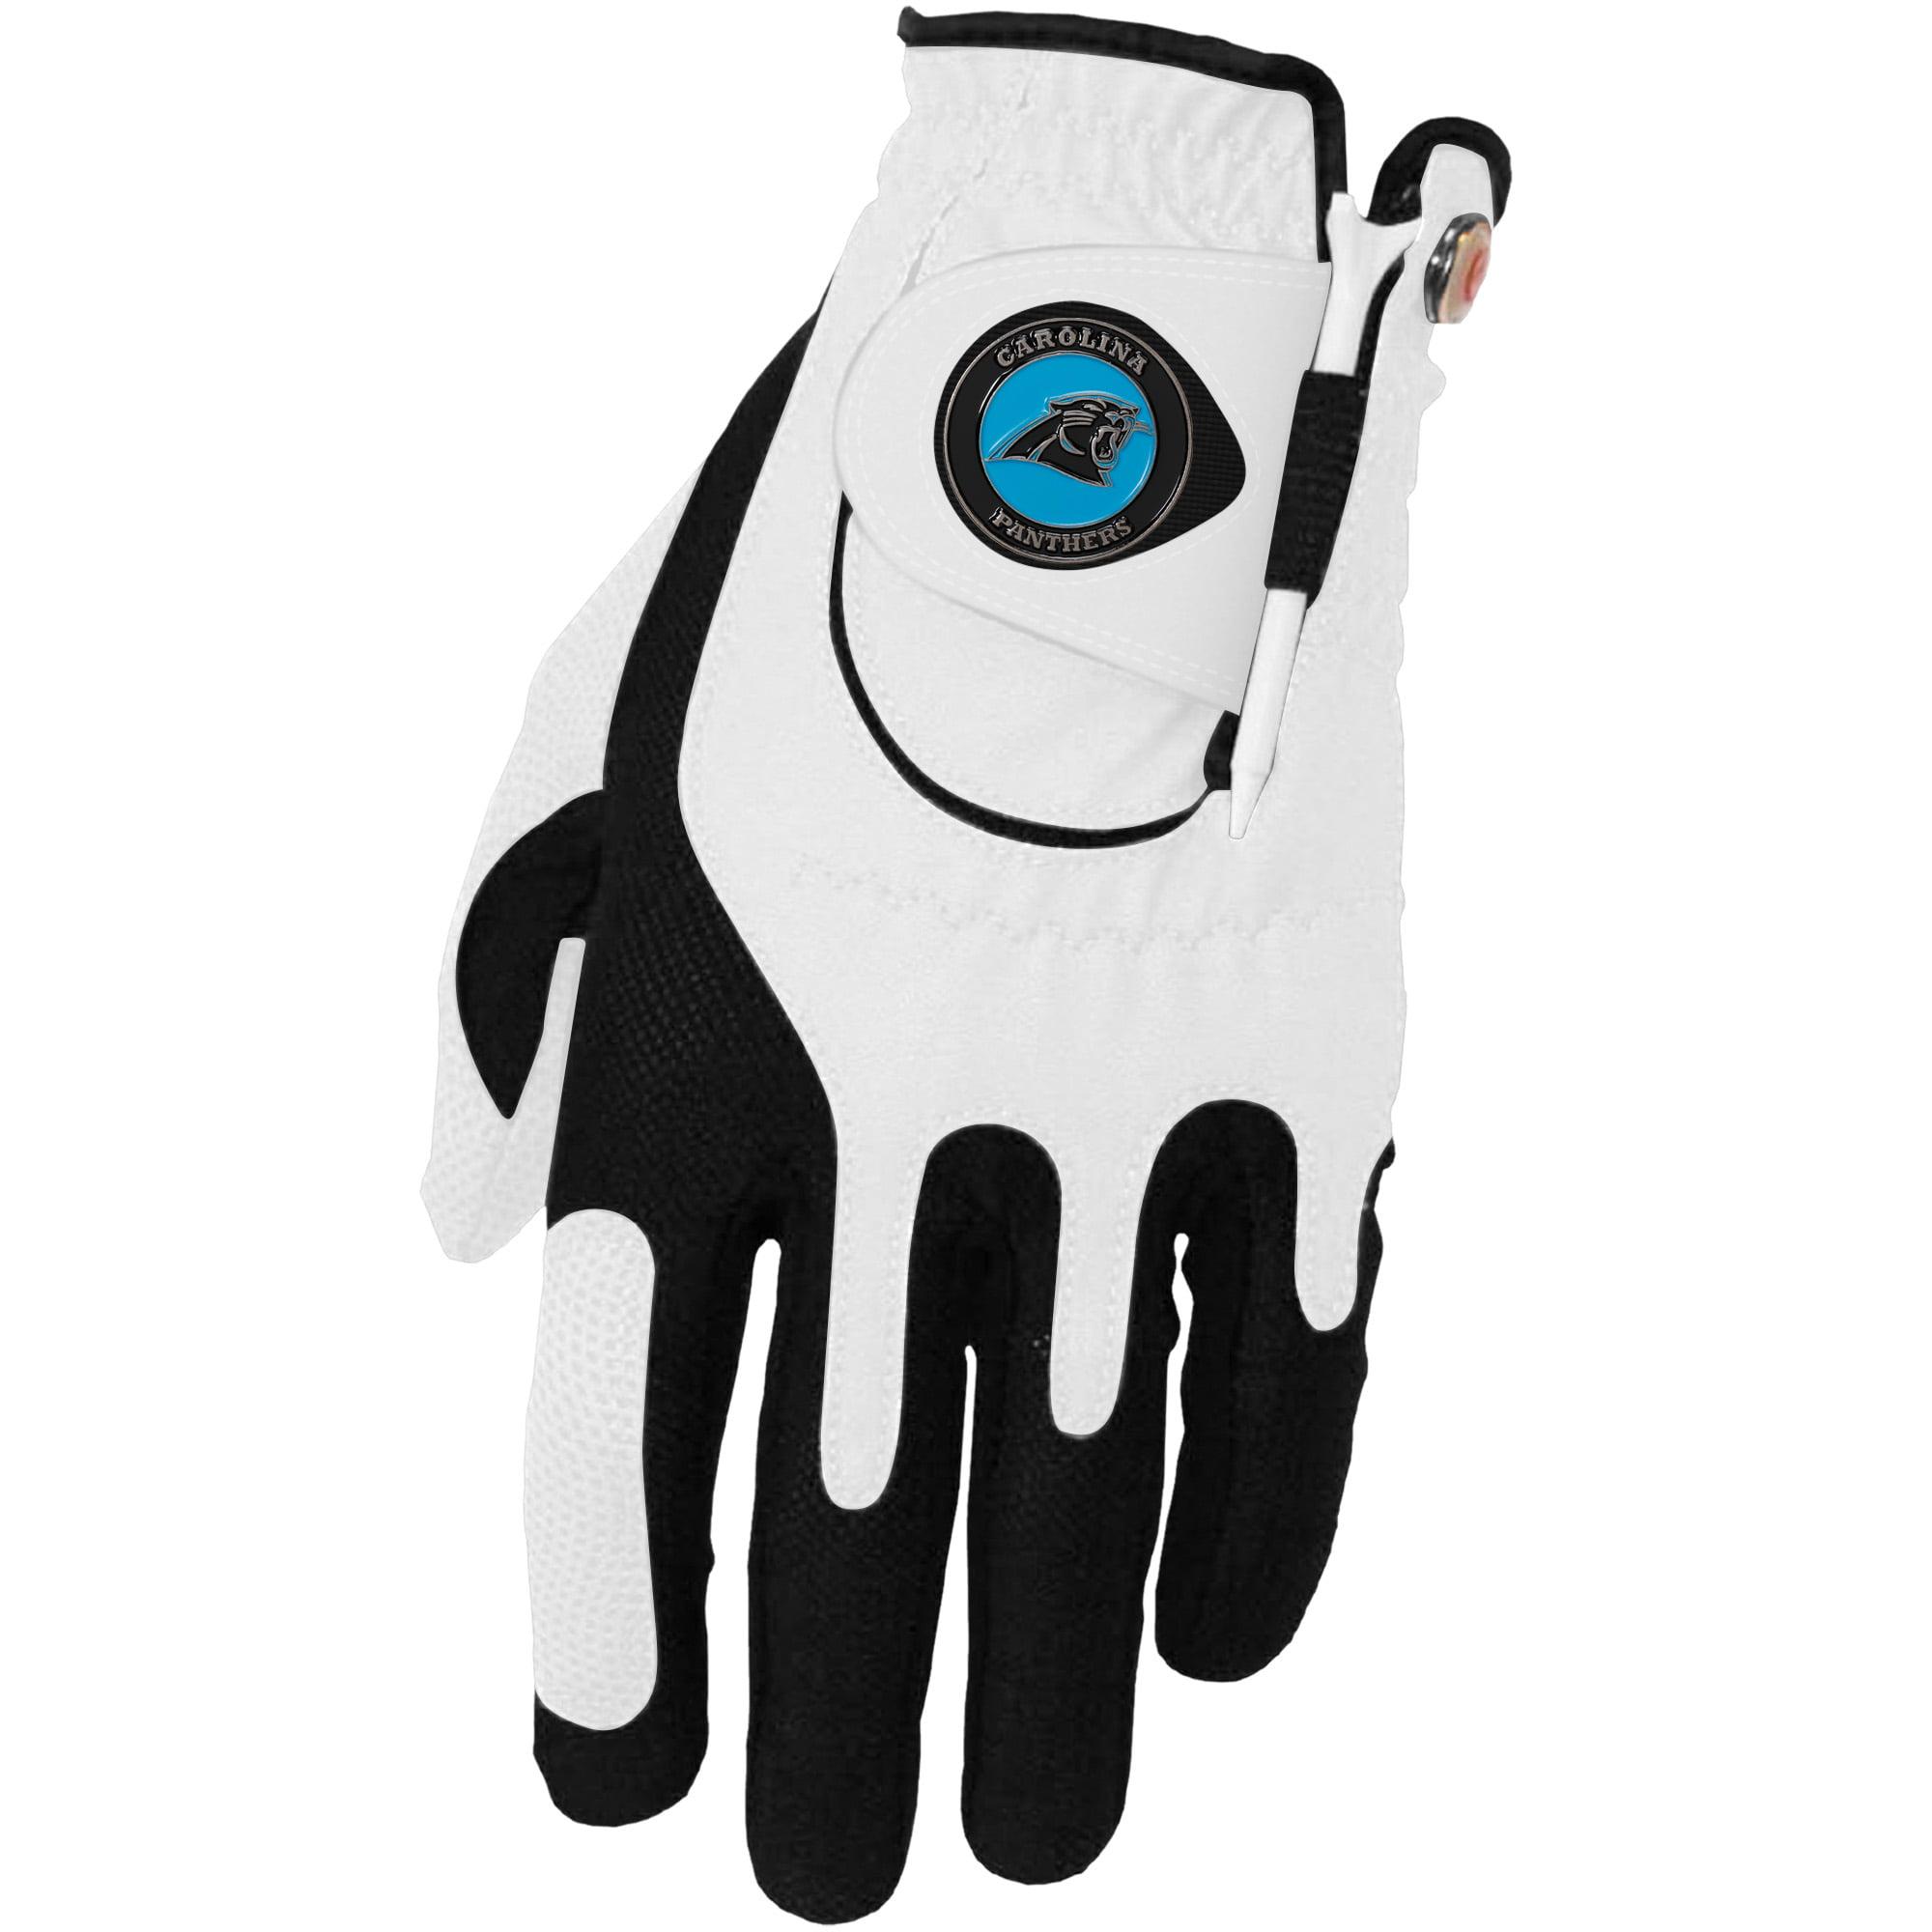 Carolina Panthers Left Hand Golf Glove & Ball Marker Set - White - OSFM